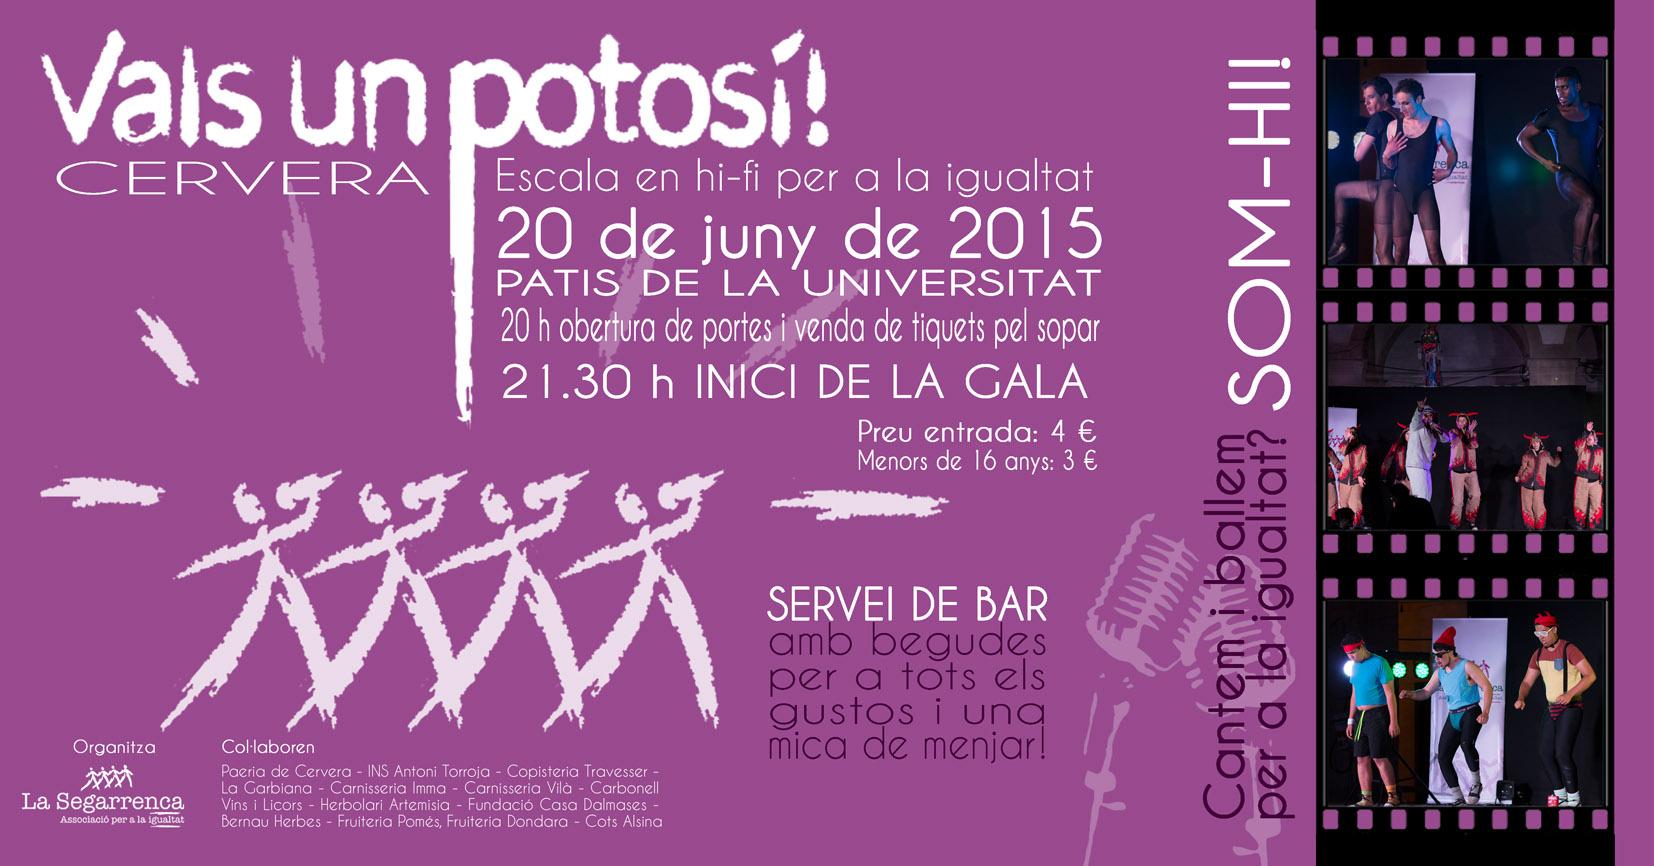 cartell Vals un Potosí!